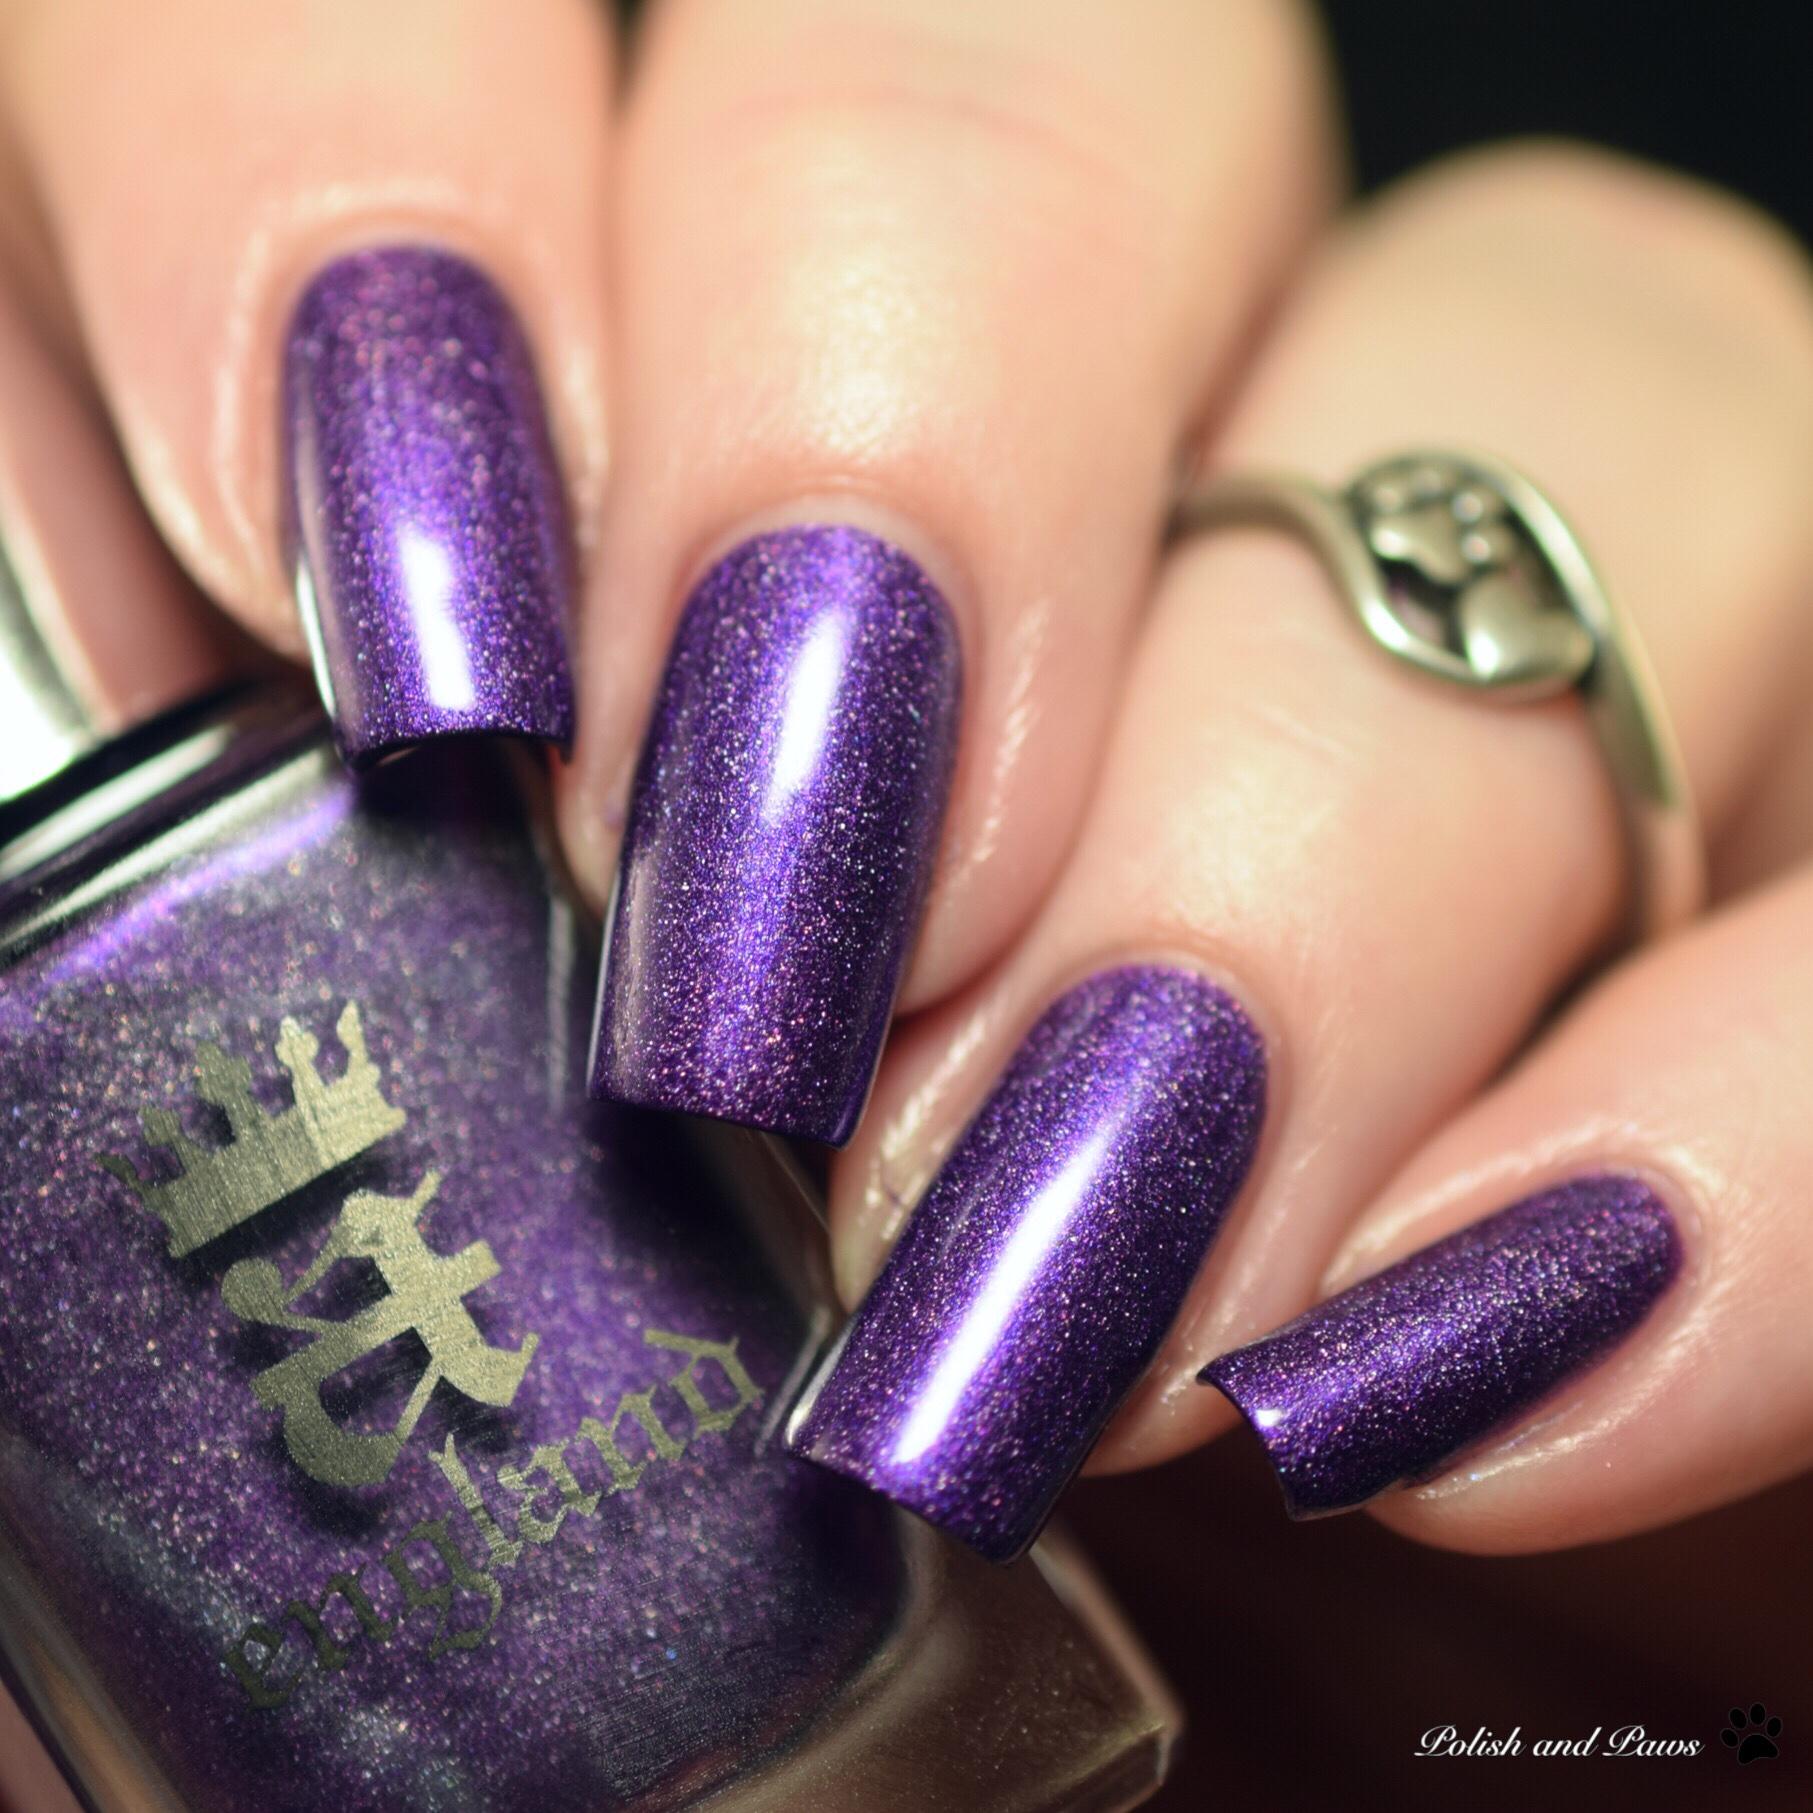 Beautometry My Mani Box ~ AEngland The Most Happy